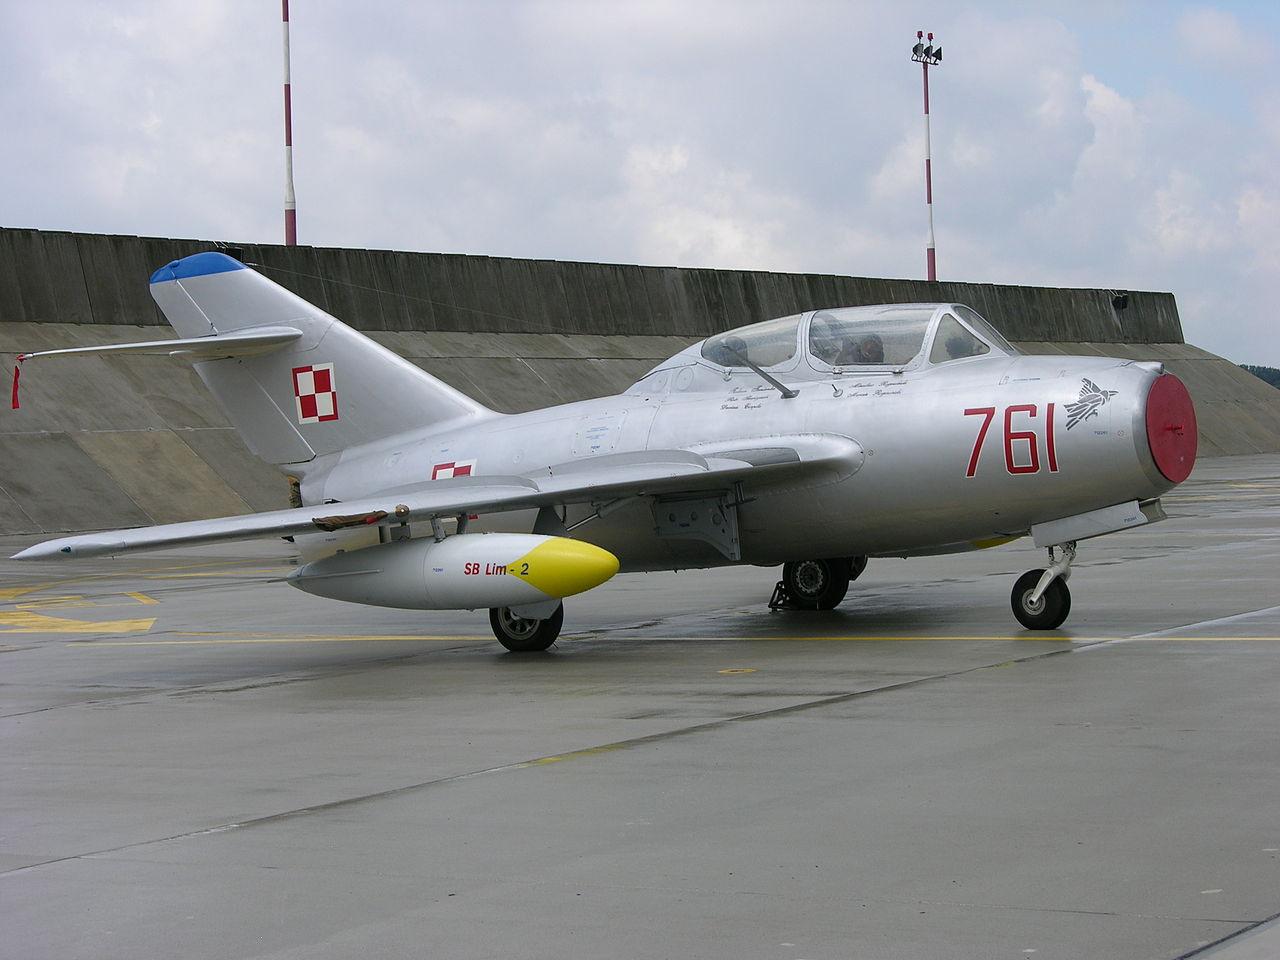 Imágenes numeradas - Página 16 1280px-761_a_MiG-15UTI_preserved_at_Poznan-Krzesiny_%283118035907%29